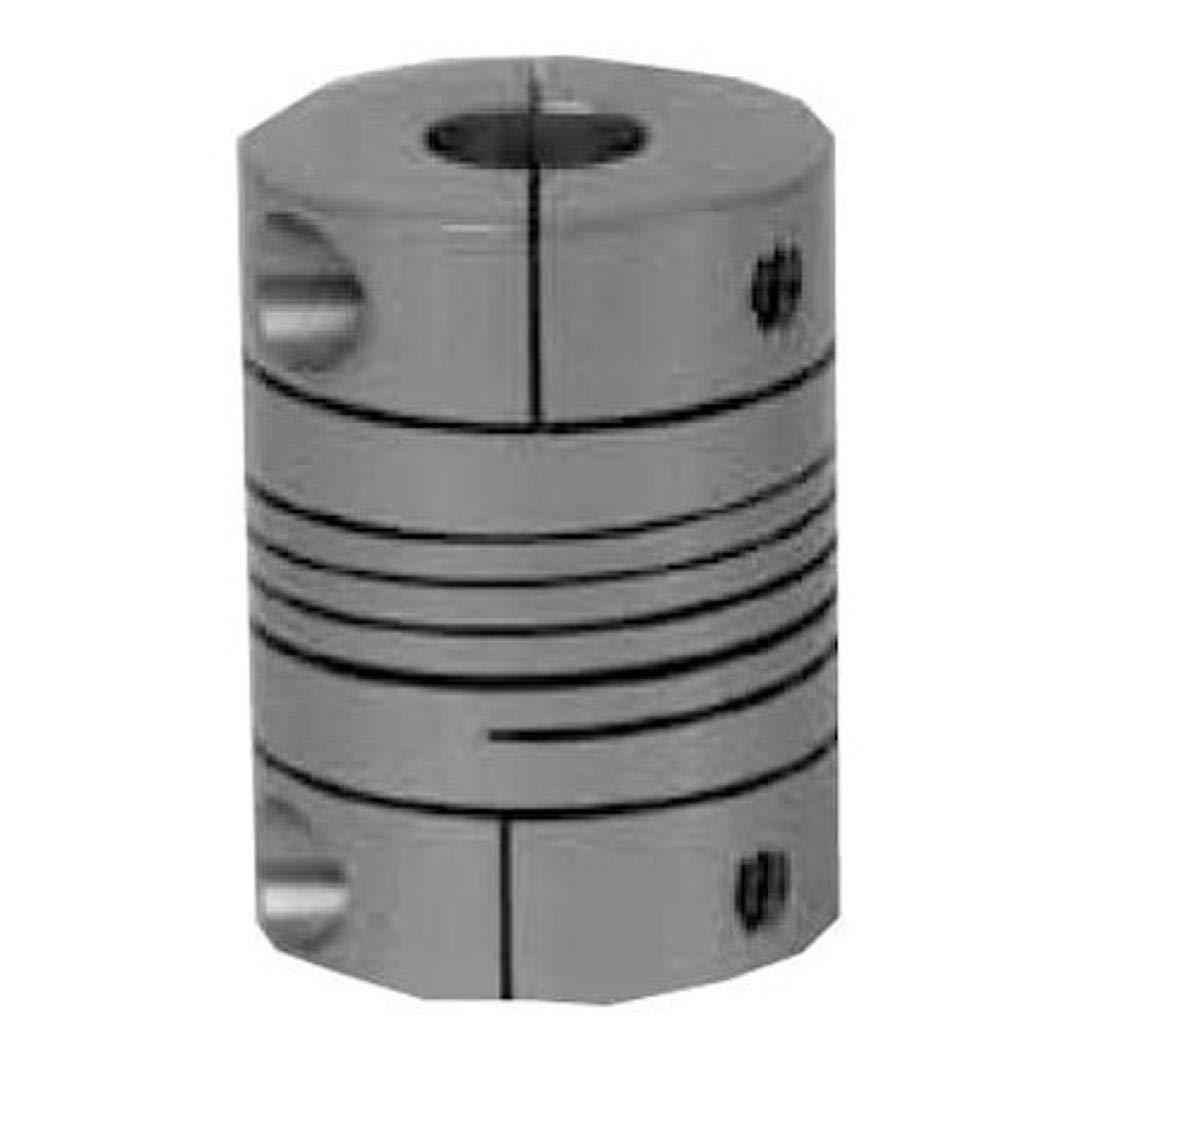 Lovejoy EC100 68514456640 Single Beam Clamp Alum Rare Style Rare Coupling